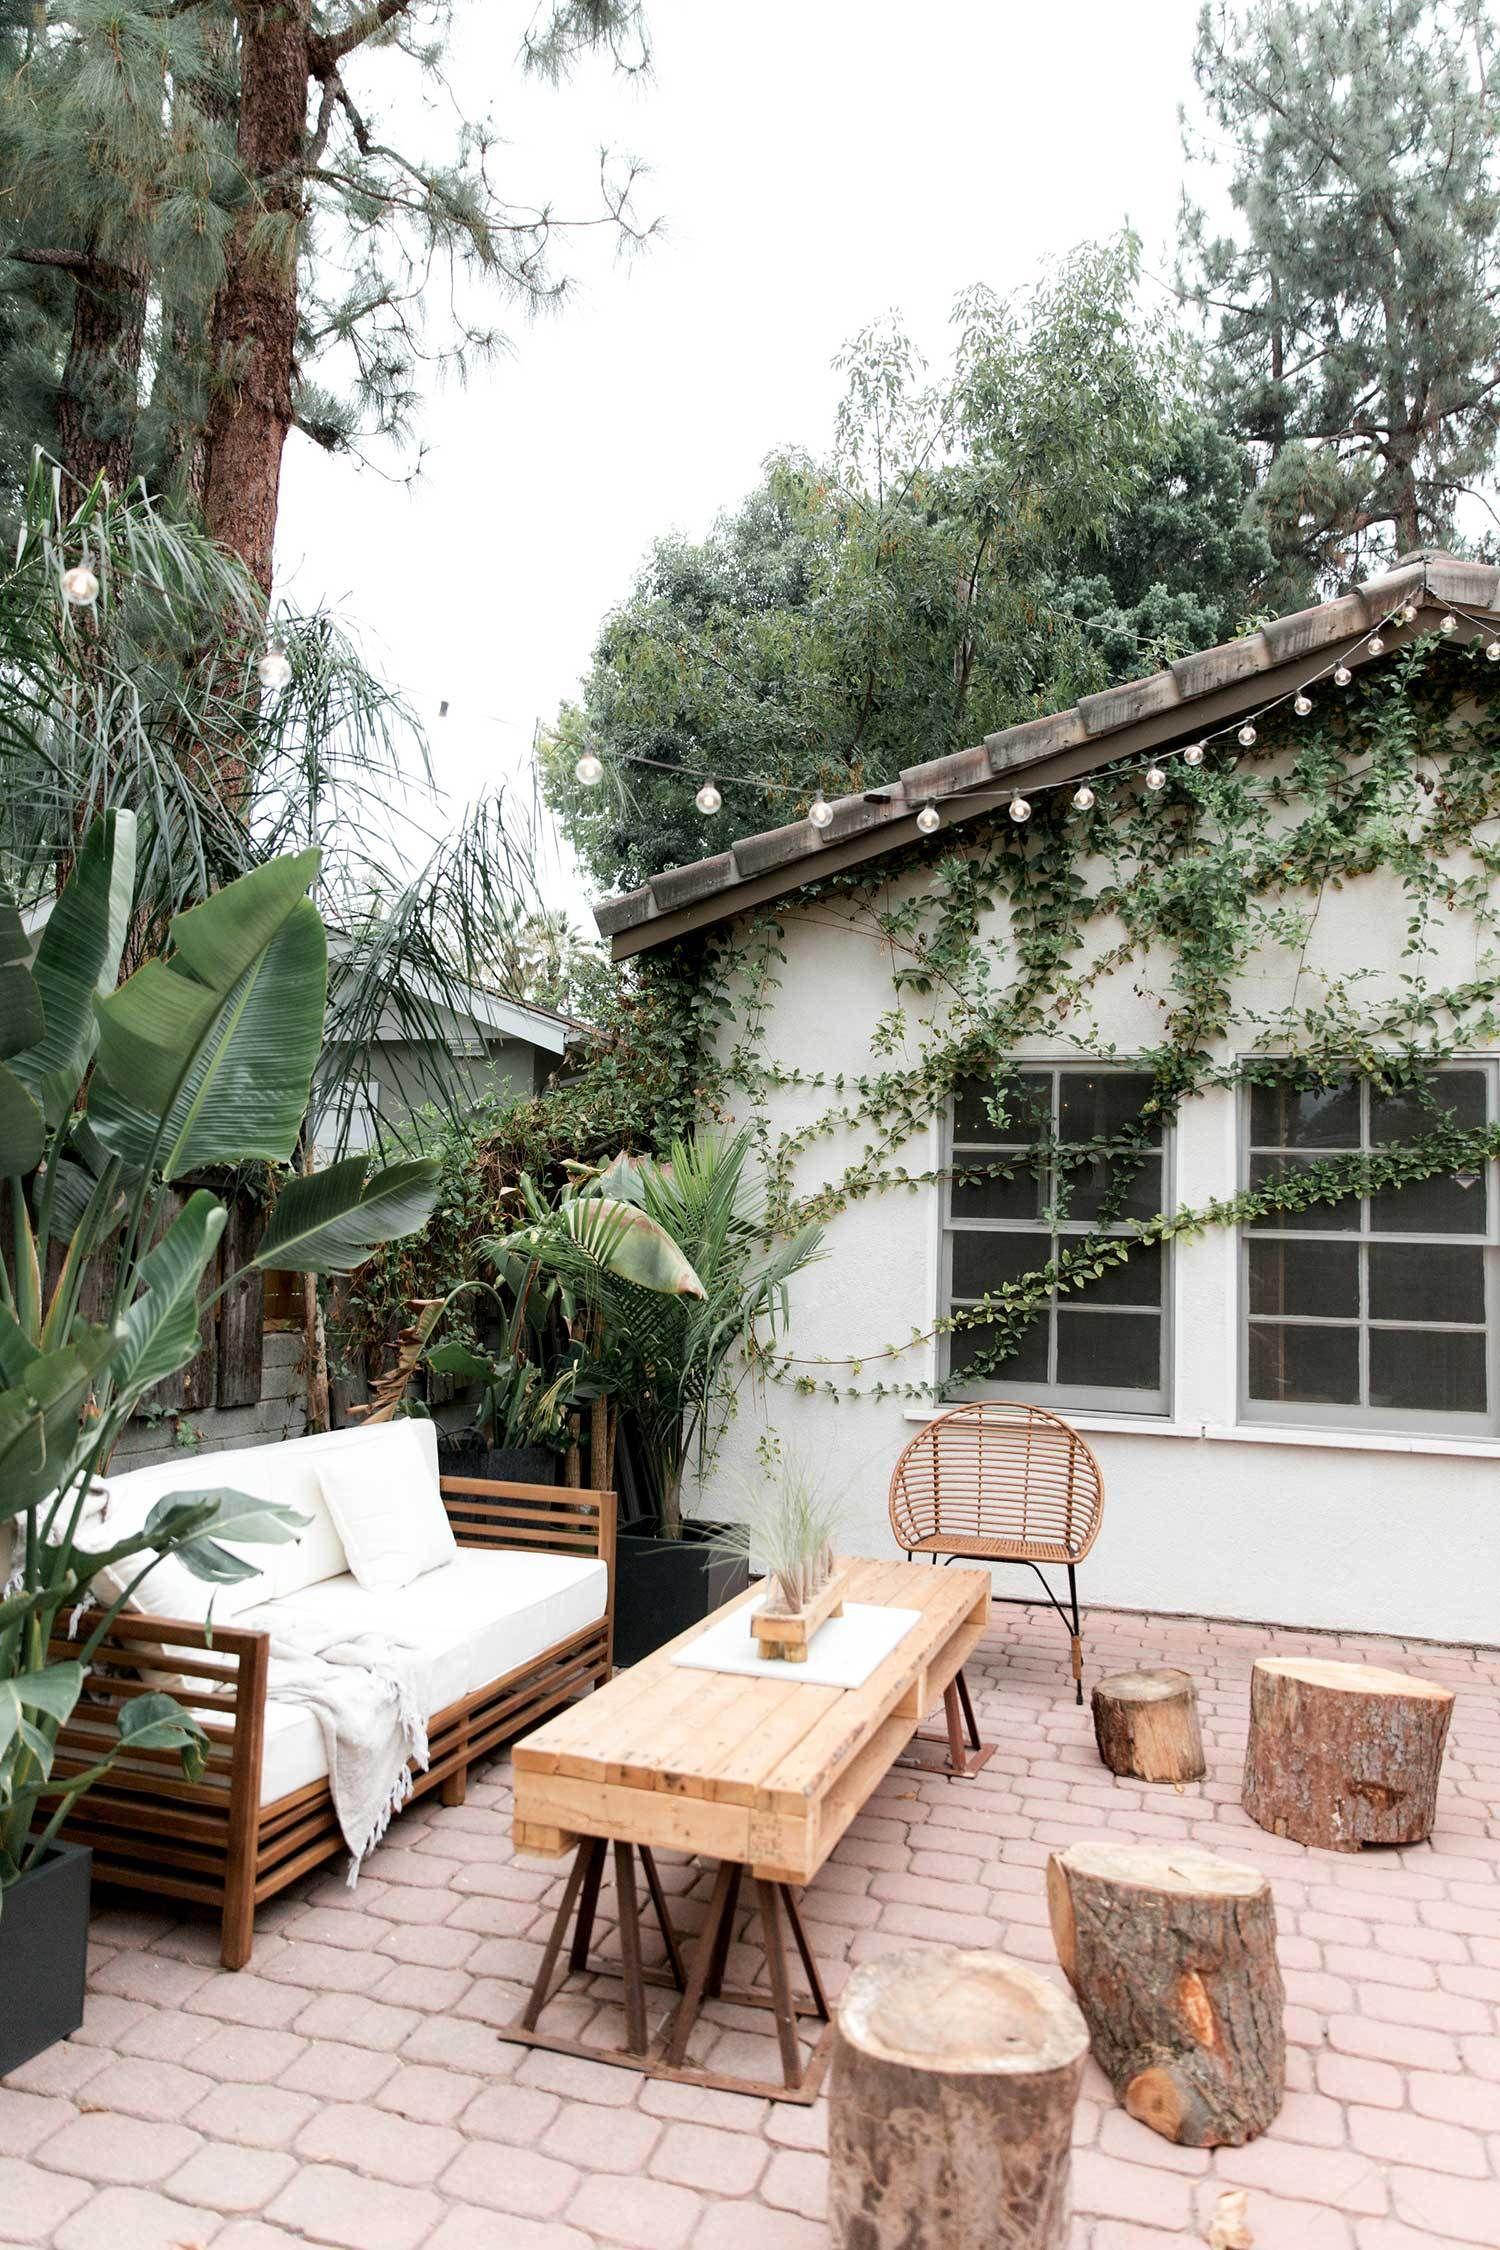 Great Outdoor Es Patio Porch Ideas Brick String Lights Bohemian California Style Living Room